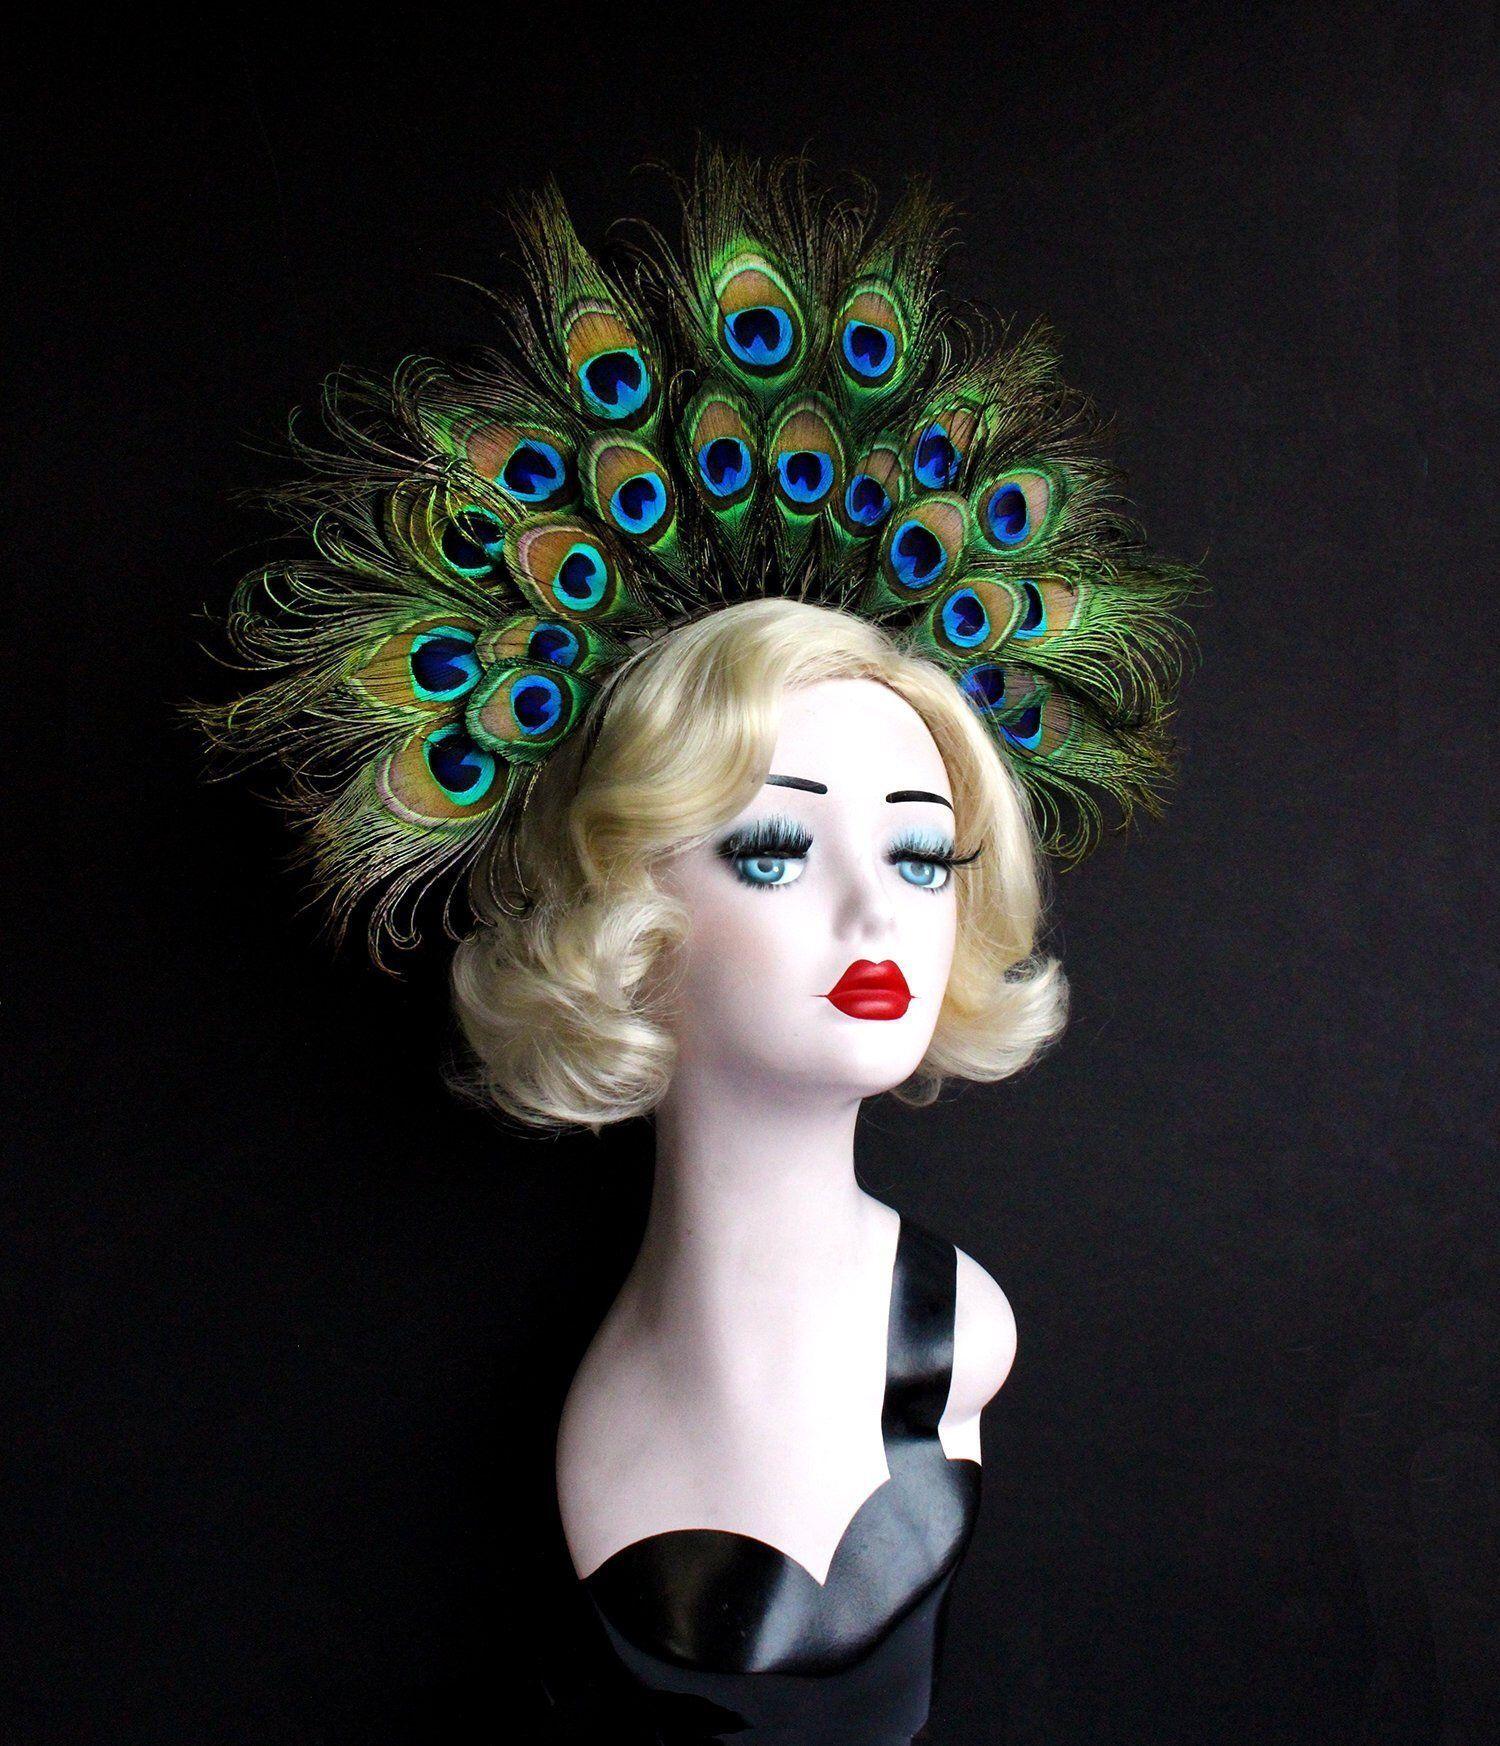 Peacock Feather Crown Headband, Showgirl Headdress, Burlesque Costume, Festival Wear, Art Deco, 1930's, Disco, Burning Man, Drag #crownheadband